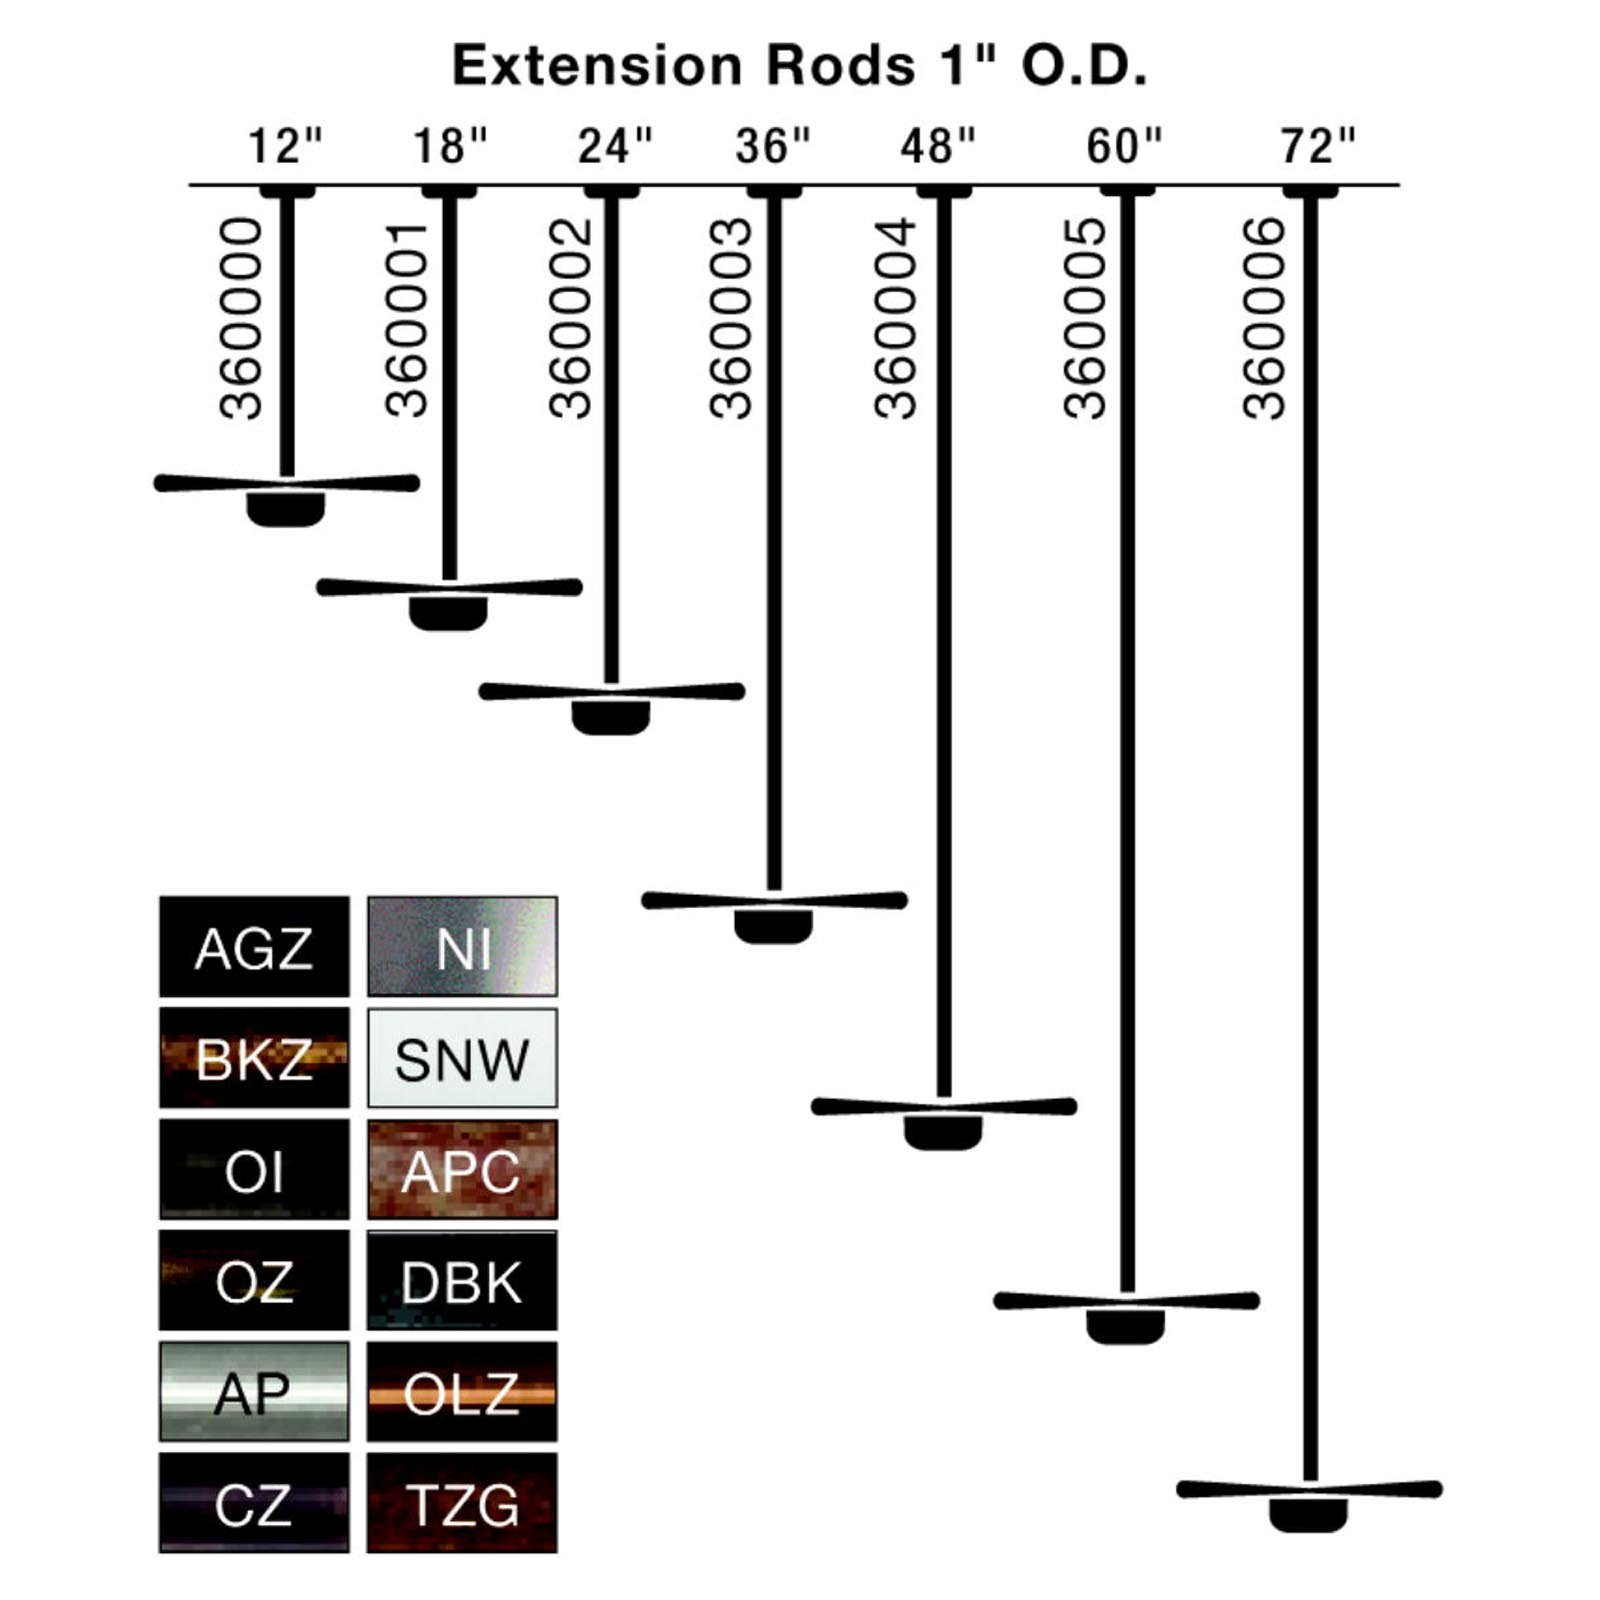 Kichler Ceiling Fan Extension Rods 1 Inch Outside